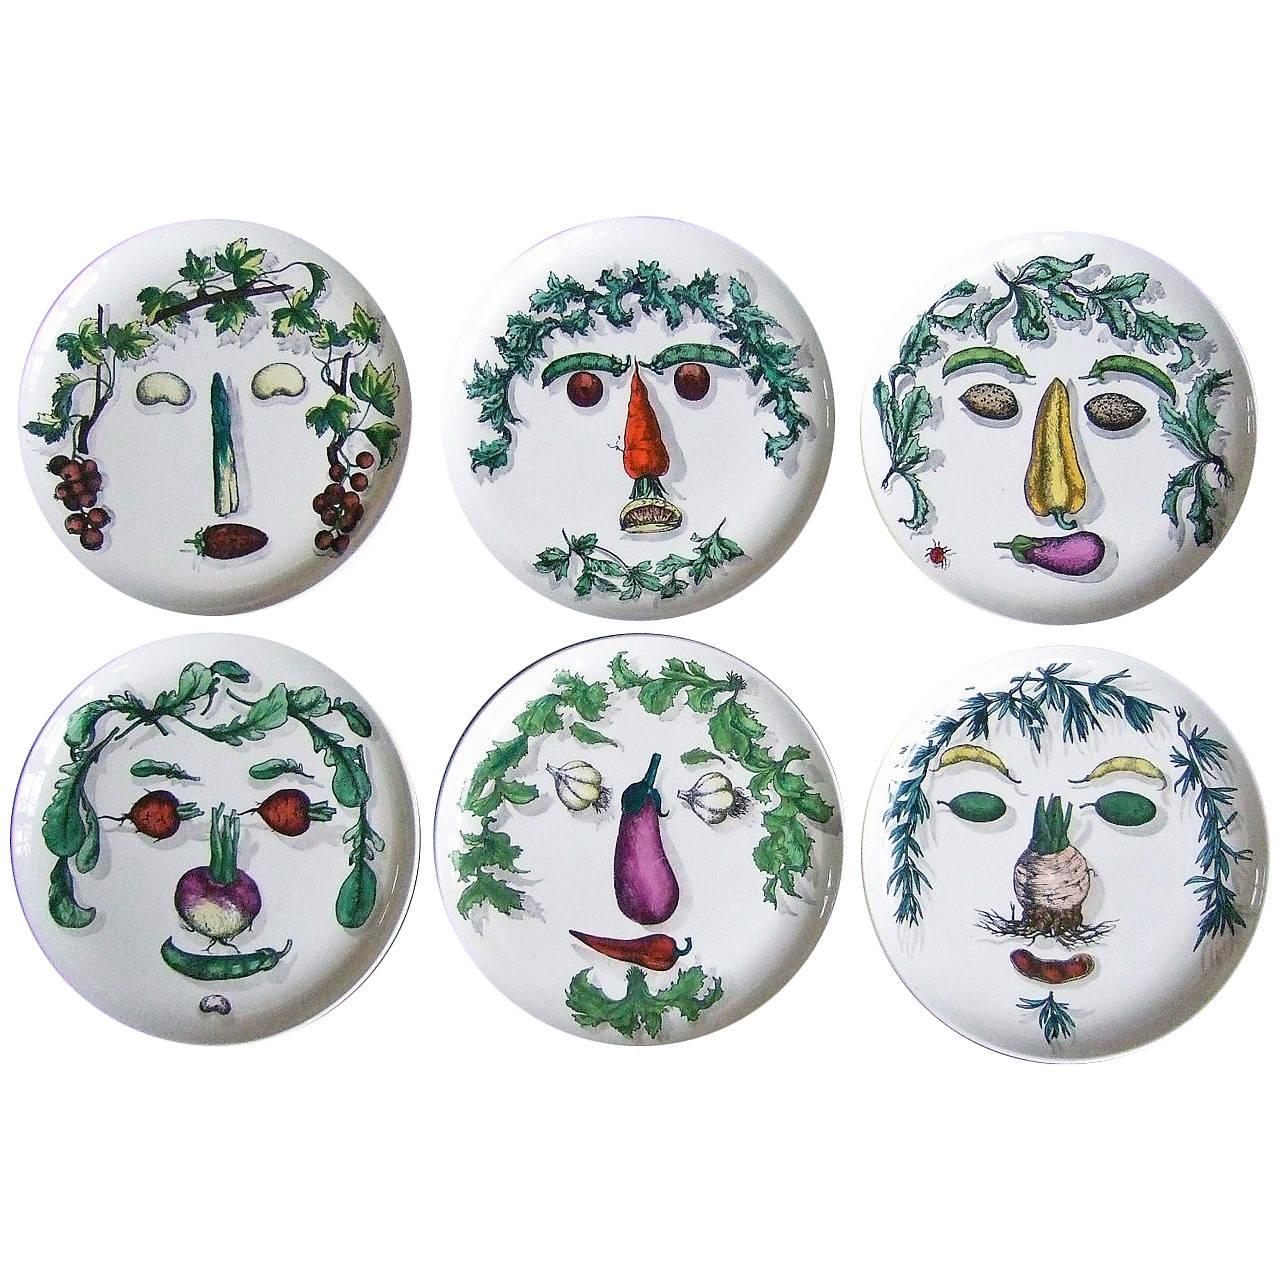 Set of Piero Fornasetti plates, 1960s